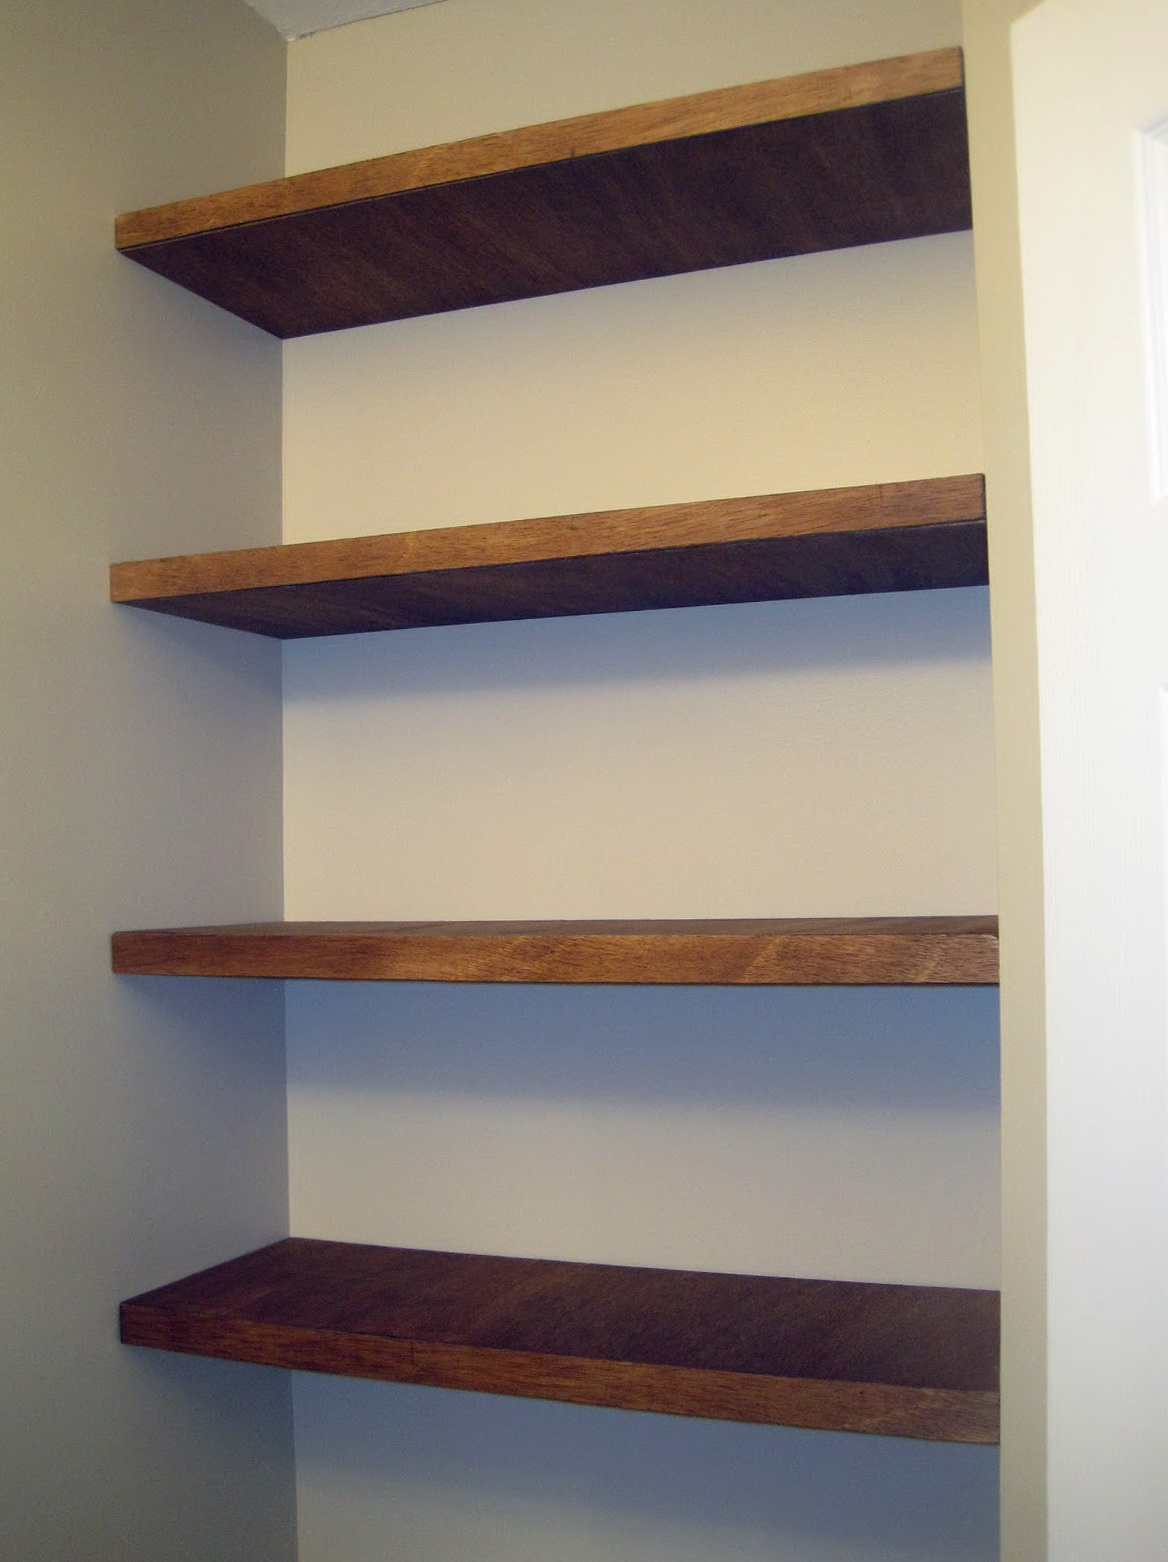 Diy Wood Wall Shelves